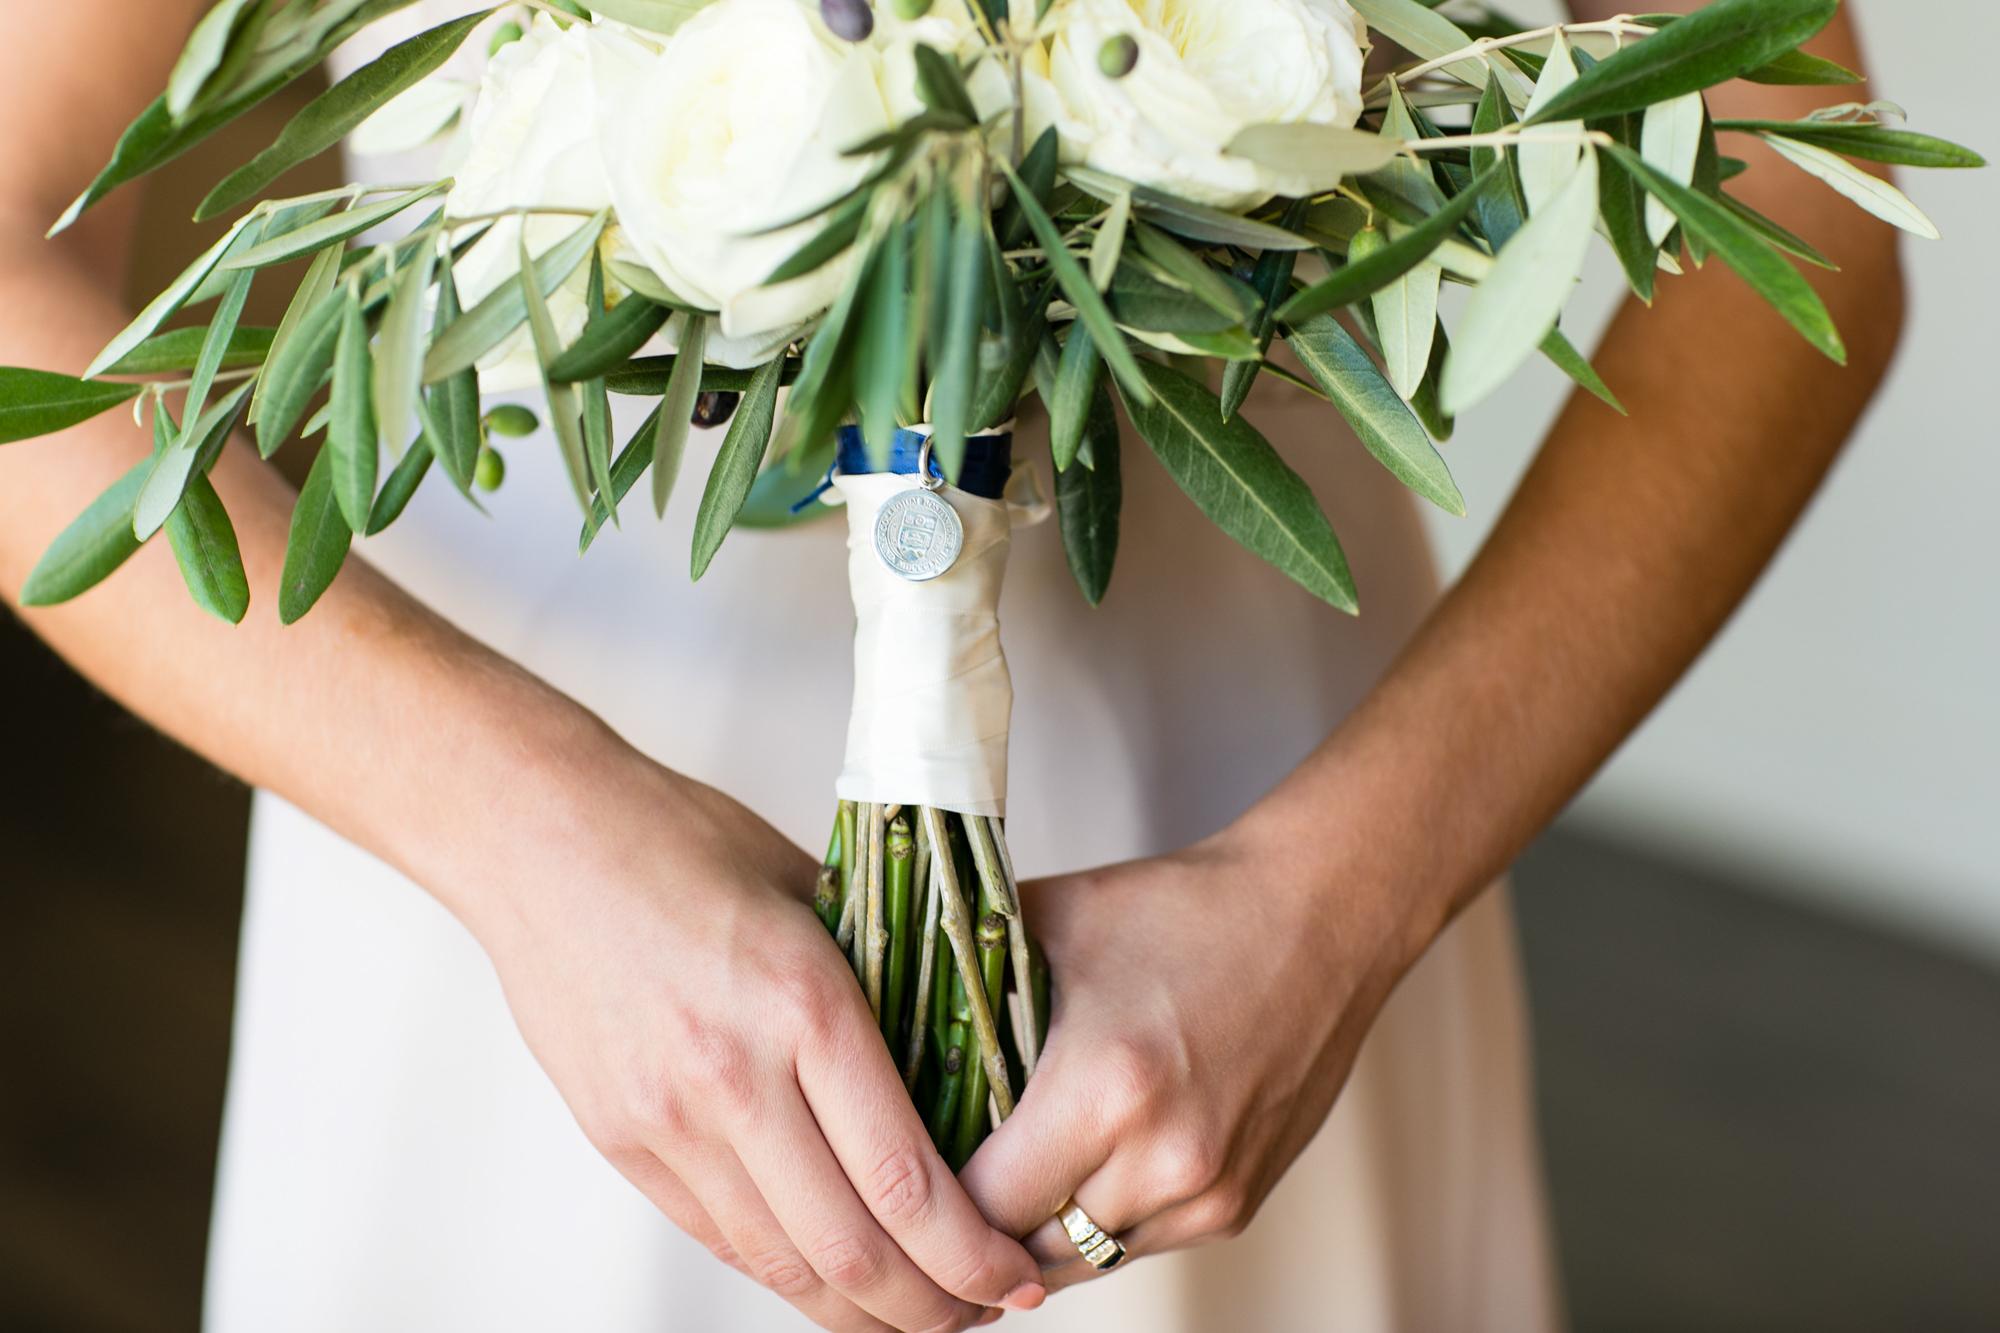 greek-wedding-salt-lake-city-utah-5.jpg